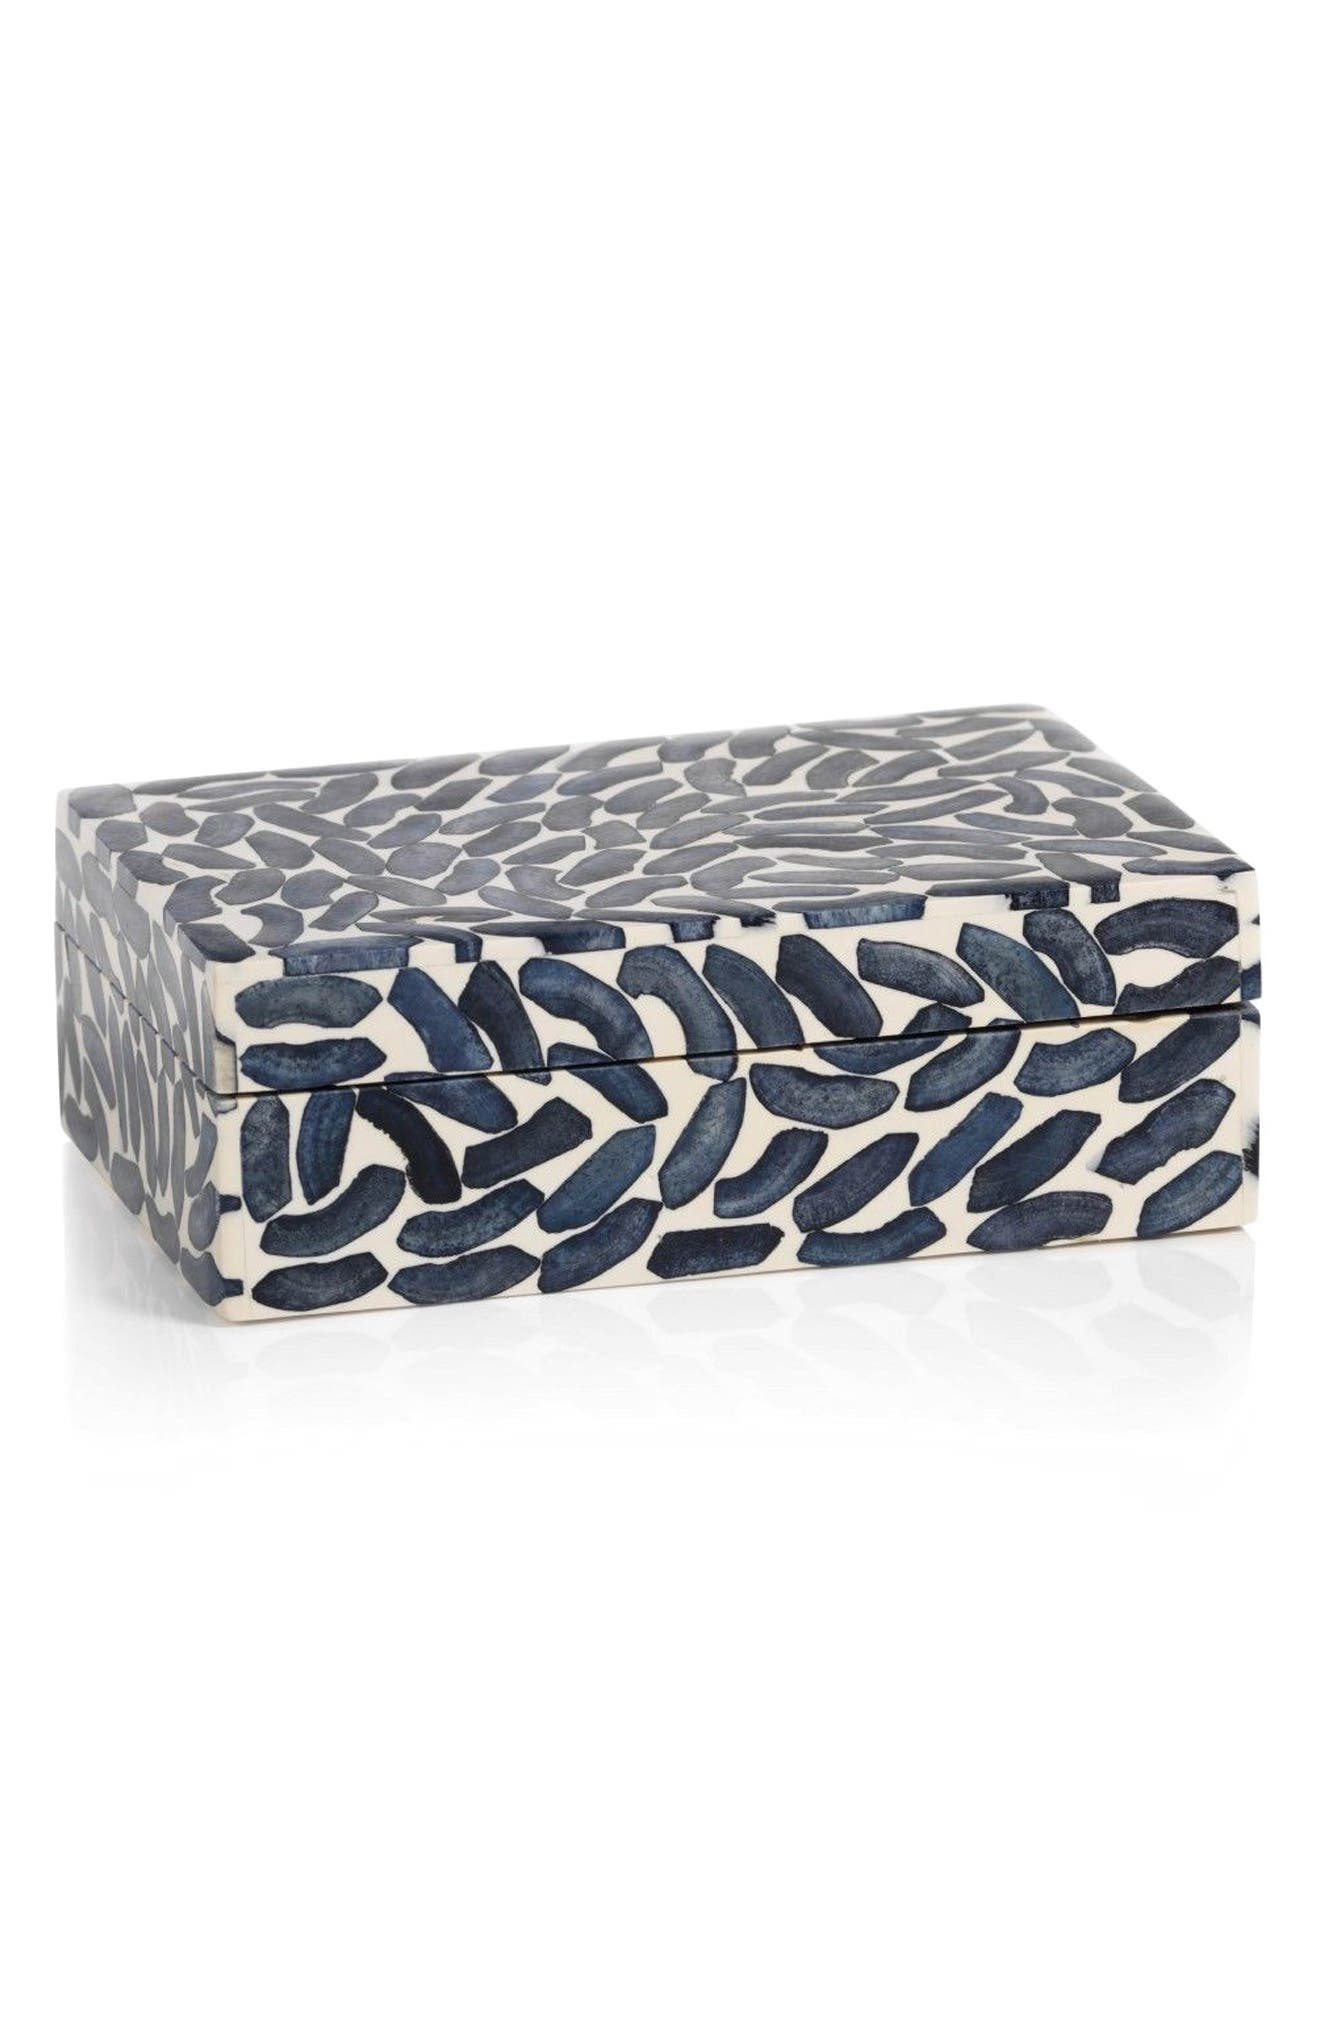 Legian Bone Jewelry Box,                         Main,                         color, Blue/ Ivory